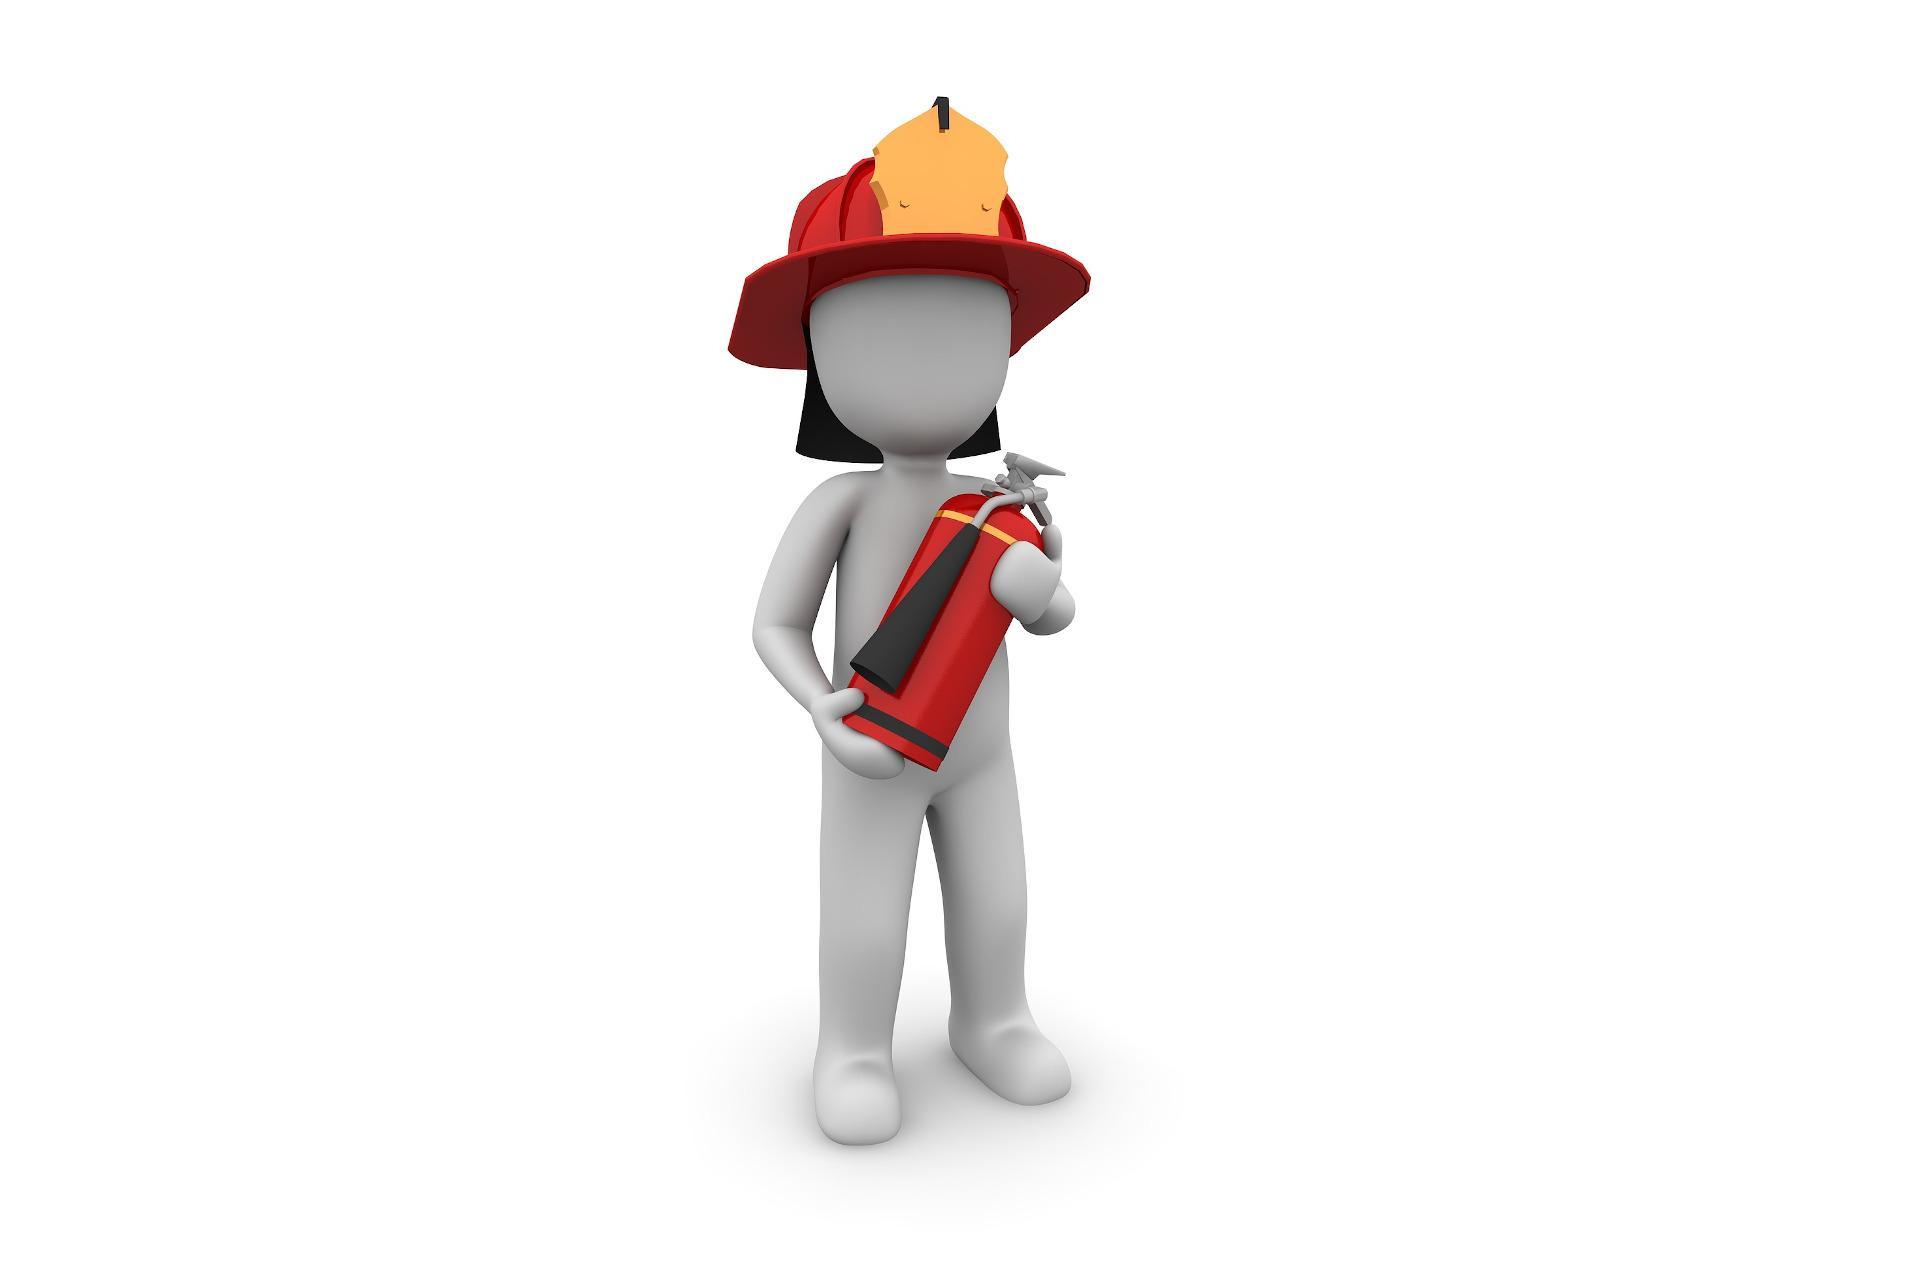 Corso Antincendio - Rischio medio